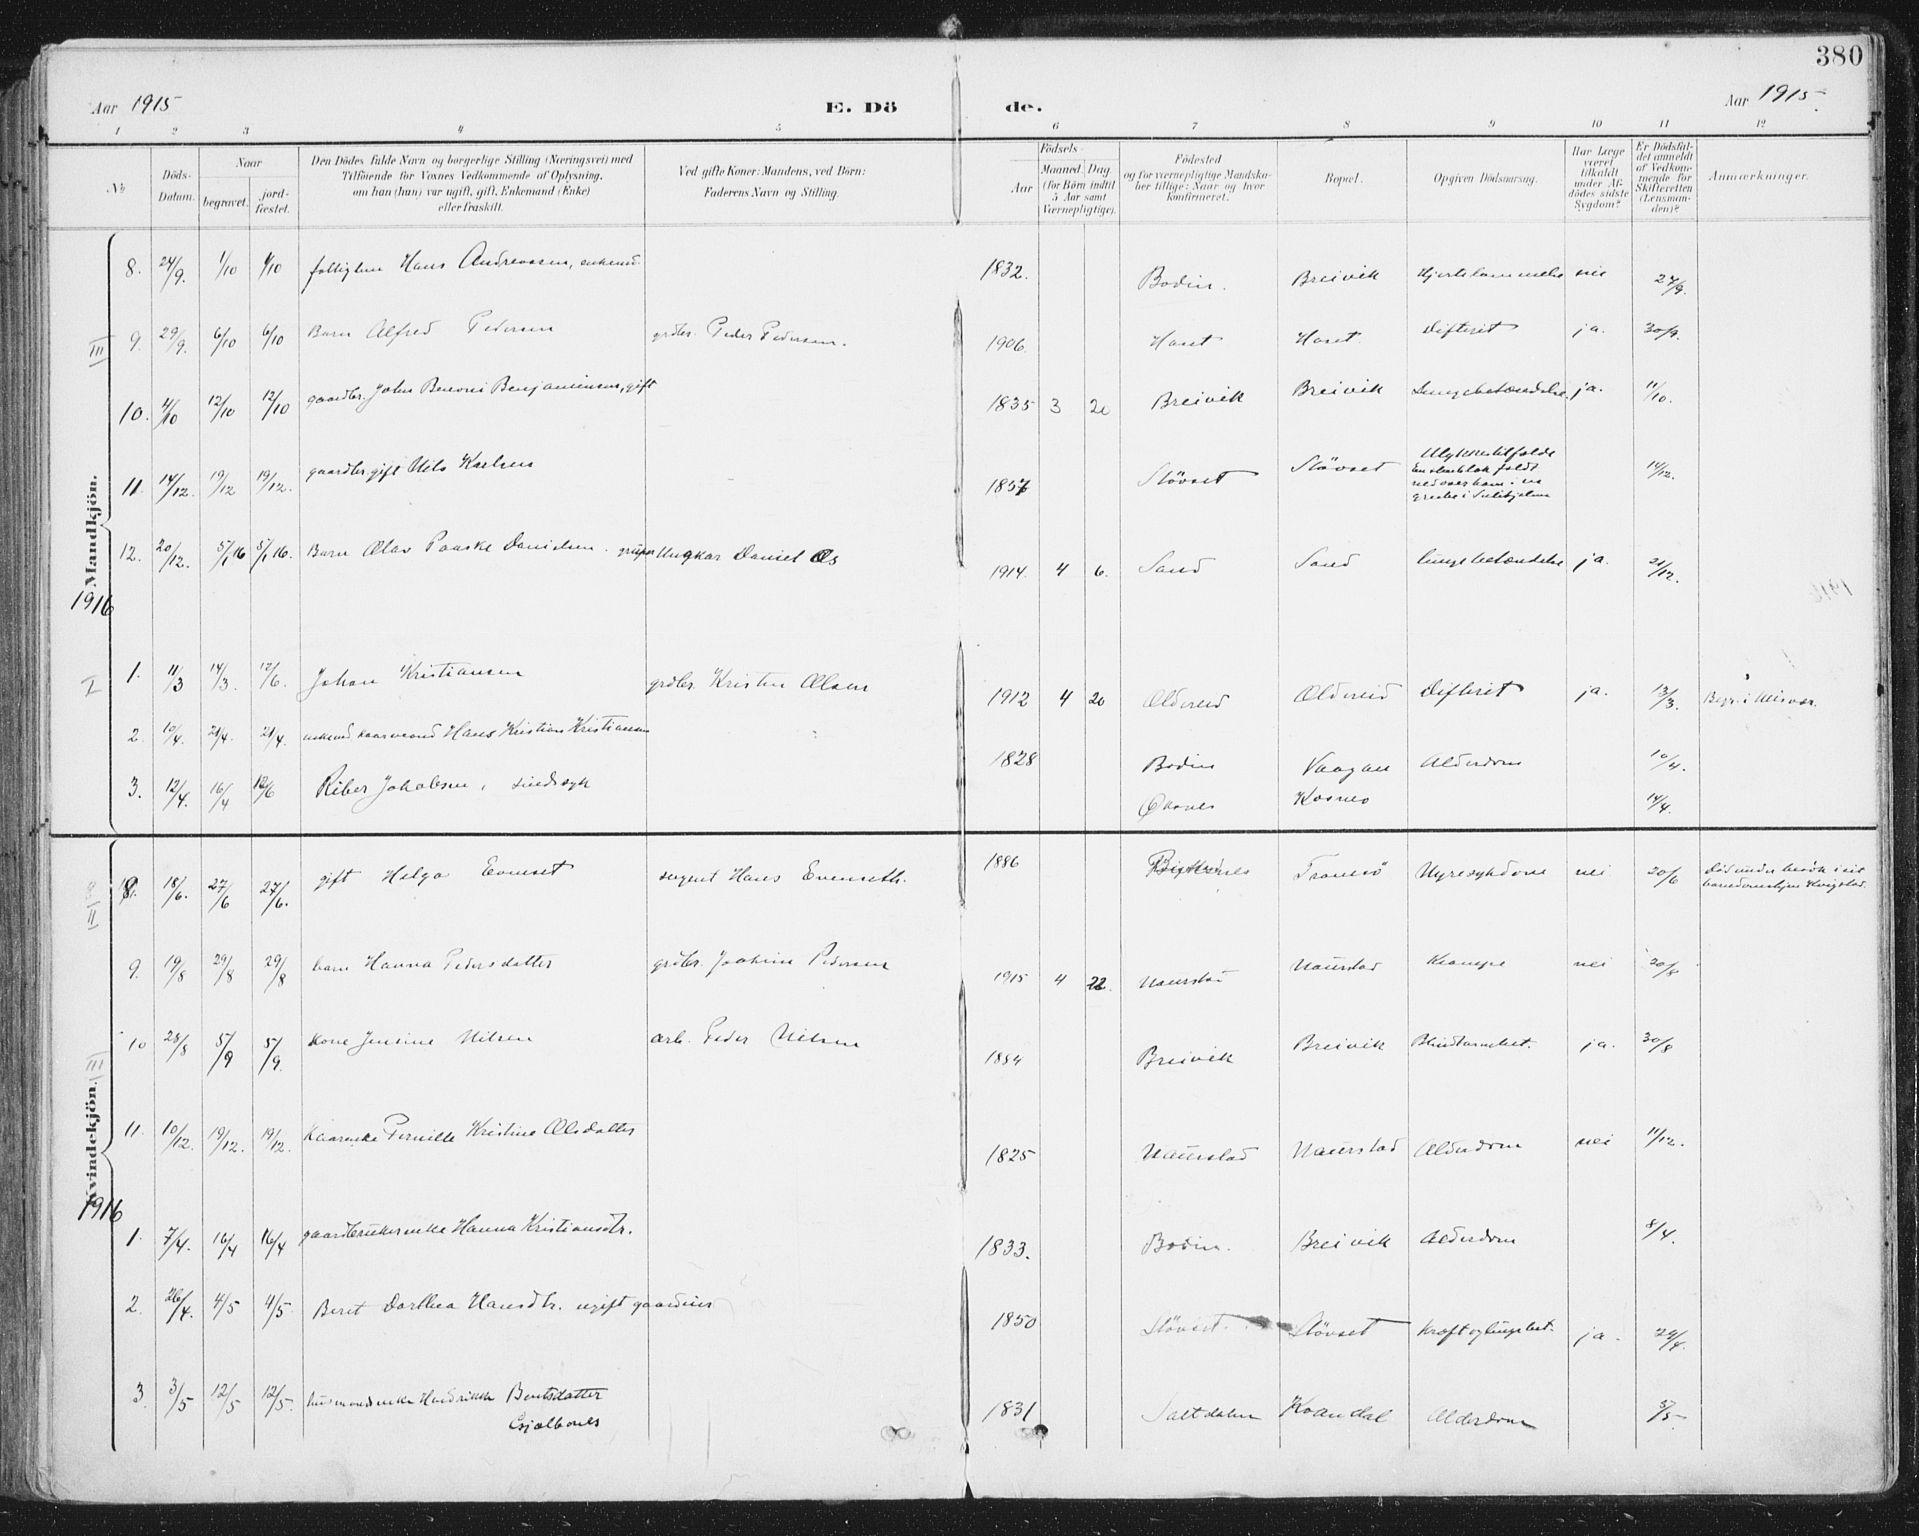 SAT, Ministerialprotokoller, klokkerbøker og fødselsregistre - Nordland, 852/L0741: Ministerialbok nr. 852A11, 1894-1917, s. 380